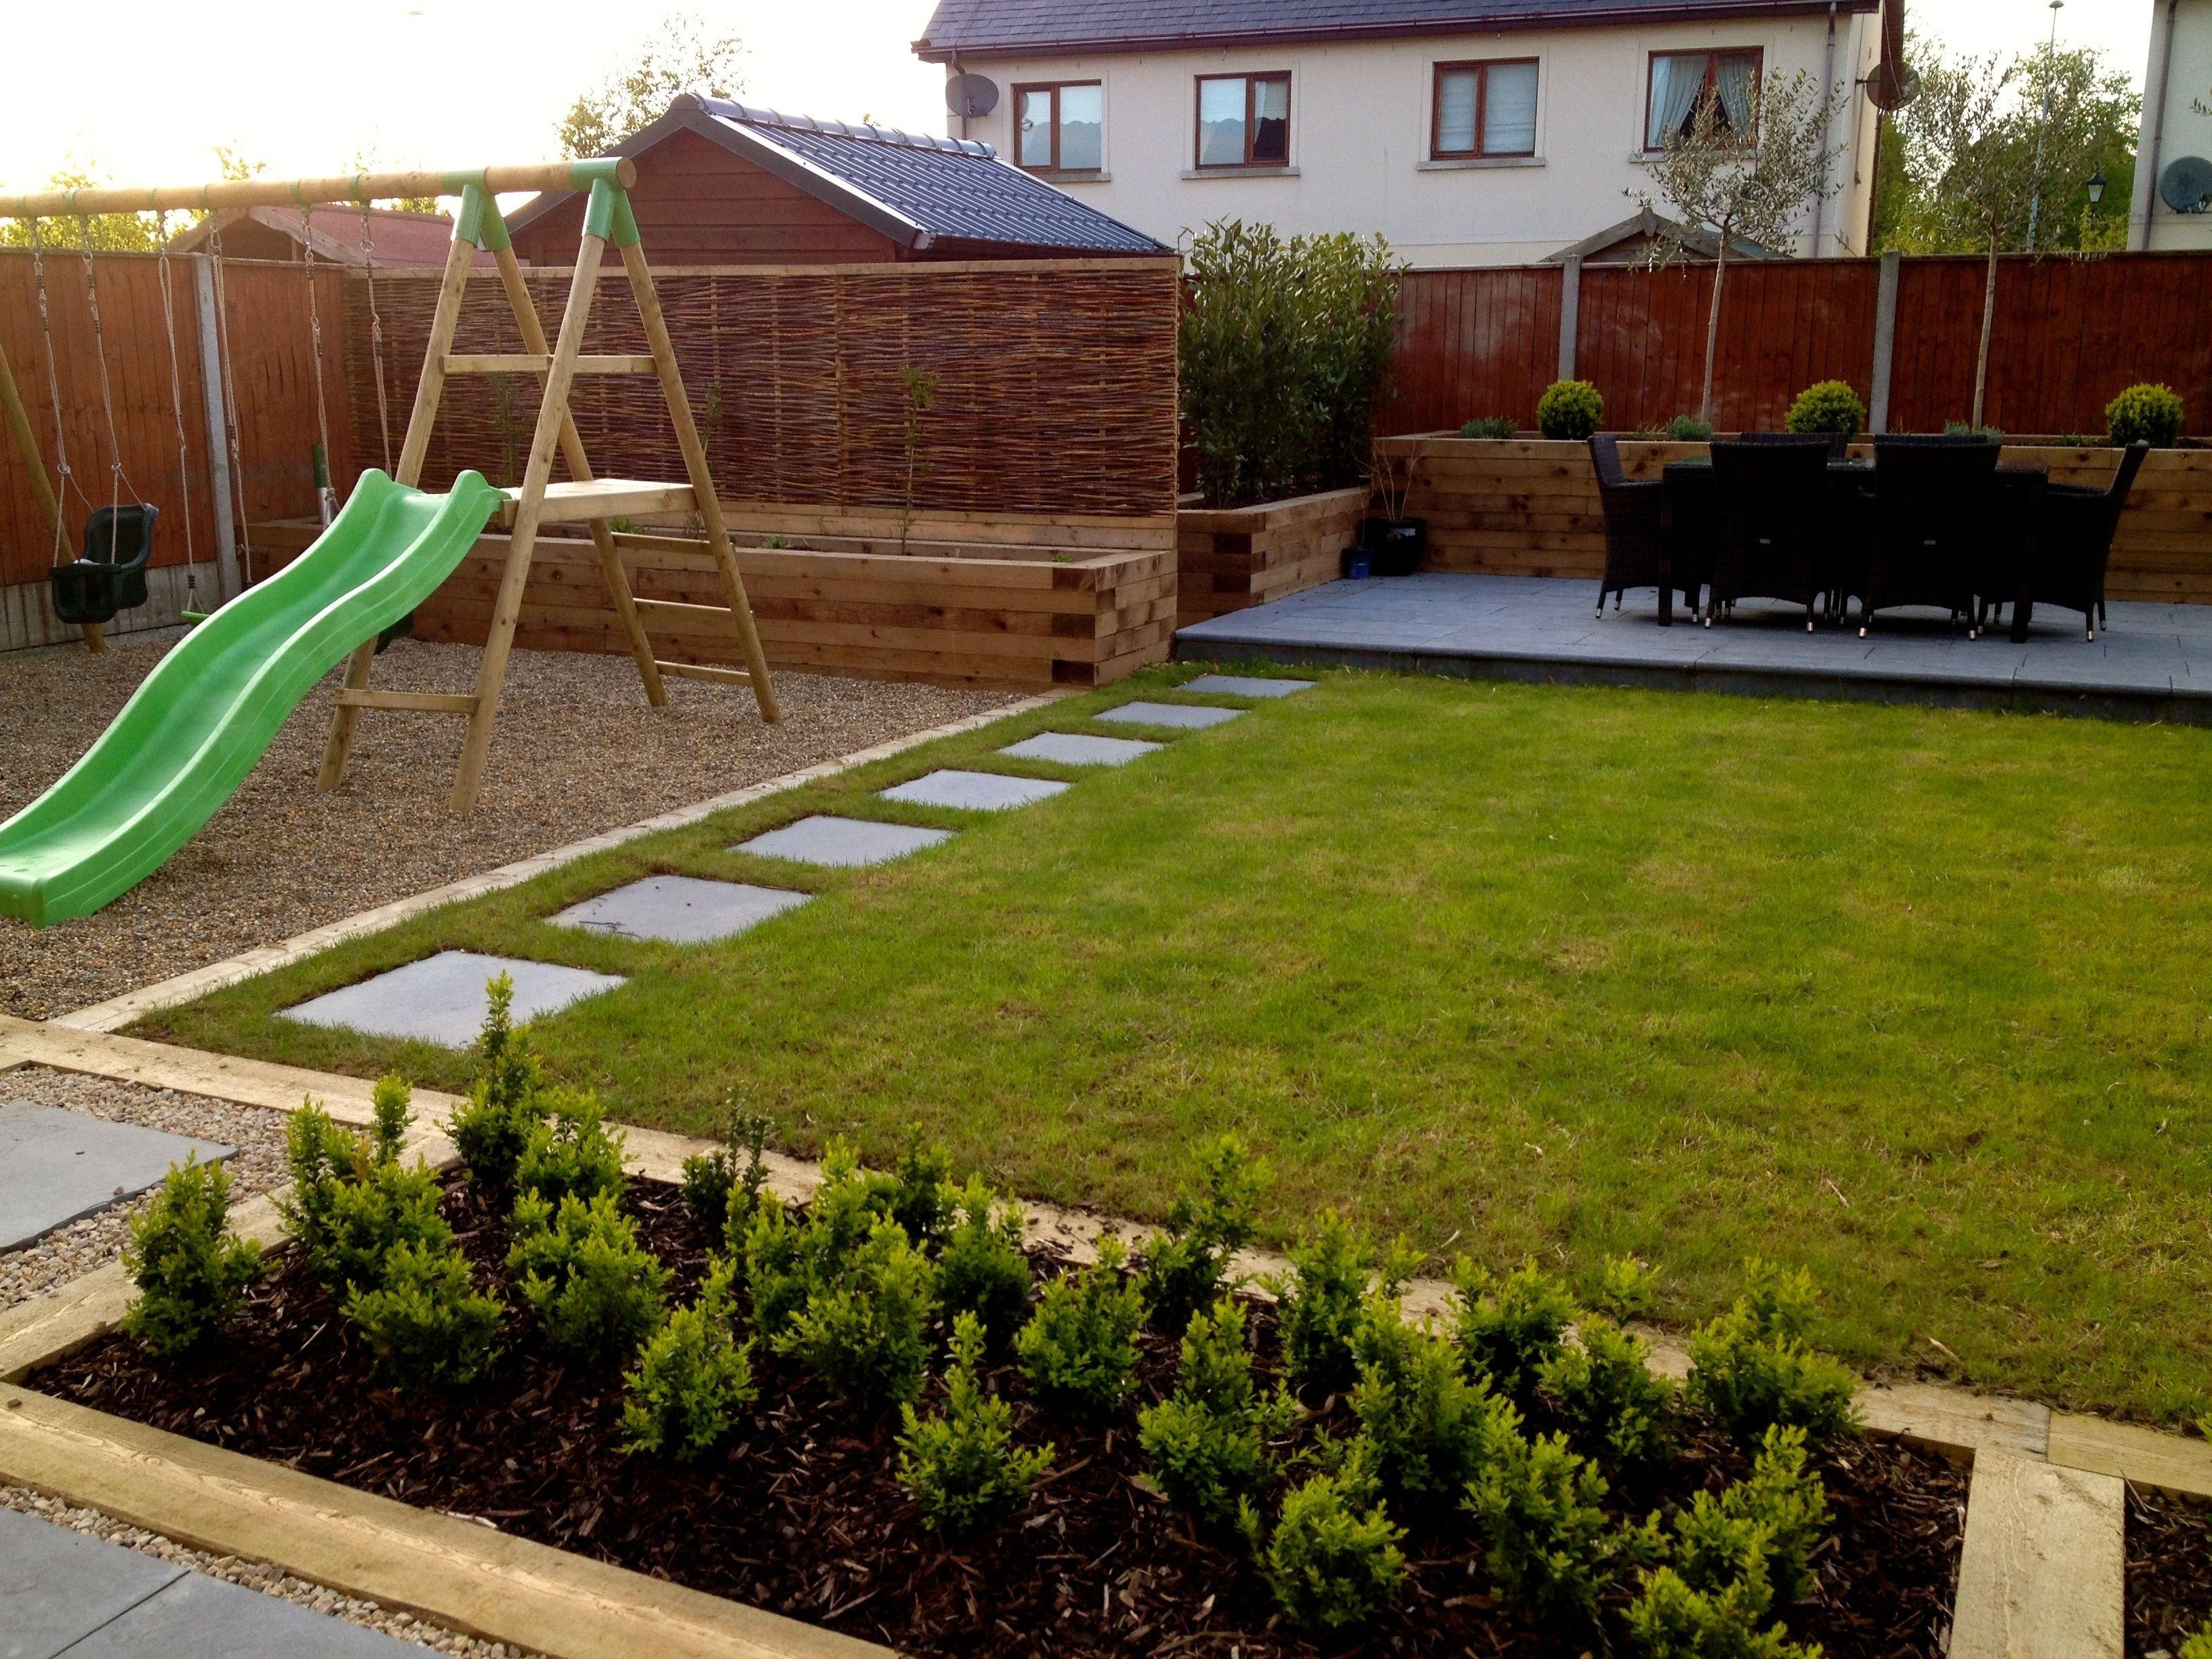 10 Perfect Garden Ideas On A Budget establishing a budget for garden design garden pinterest 2021